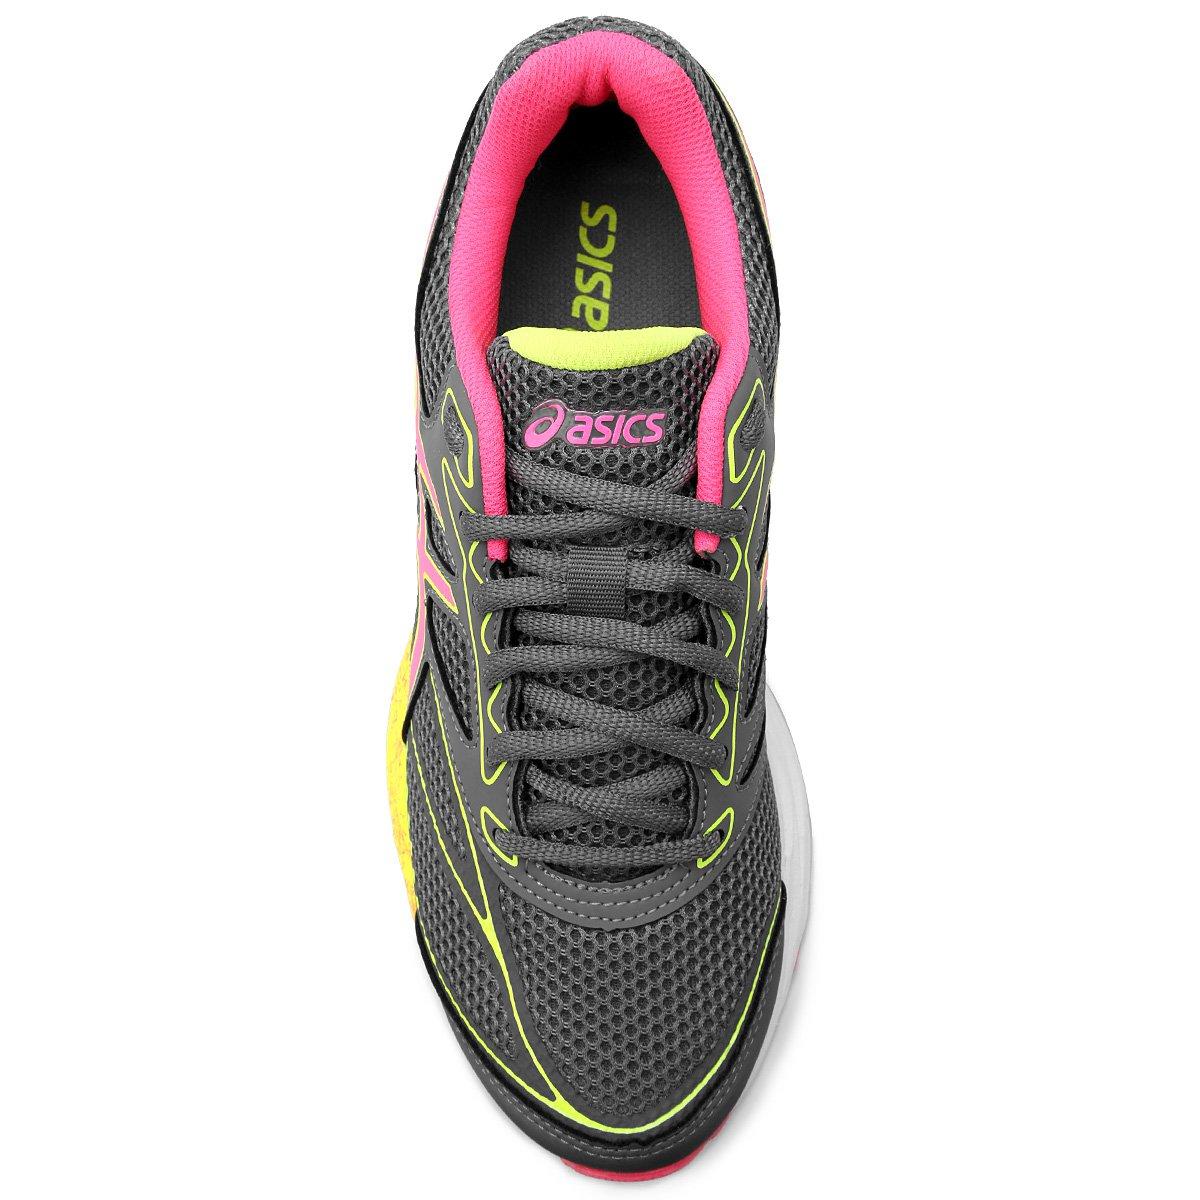 Tênis Asics Gel Pulse 8 A Feminino - Cinza e Rosa - Compre Agora ... 2d0832d2a8822